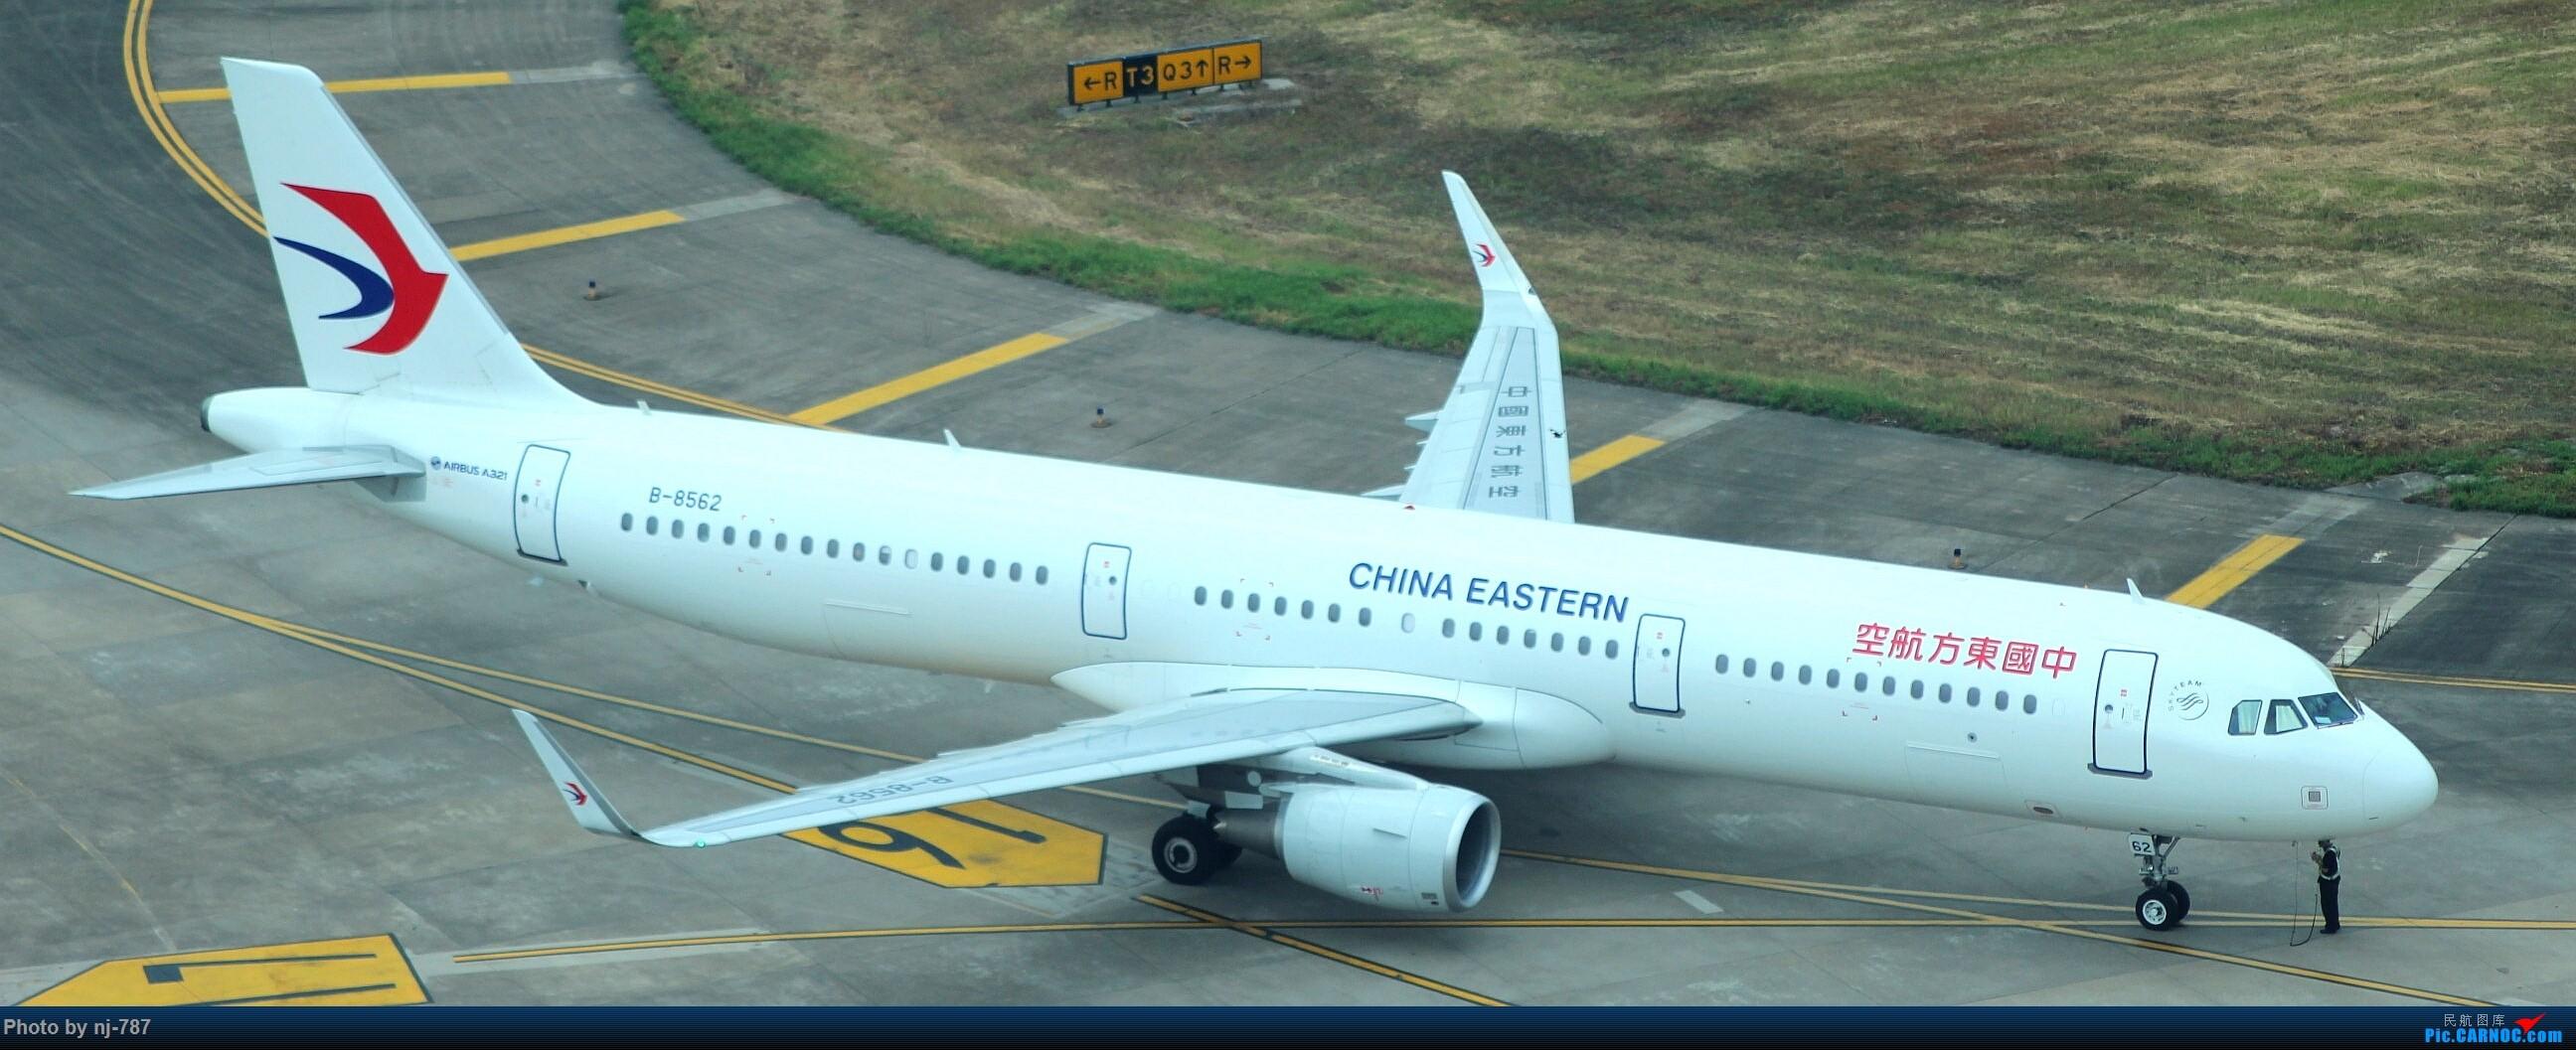 Re:[原创]站得高,看得远!NKG双跑,T2启用后初踏! AIRBUS A321-200 B-8562 南京禄口国际机场